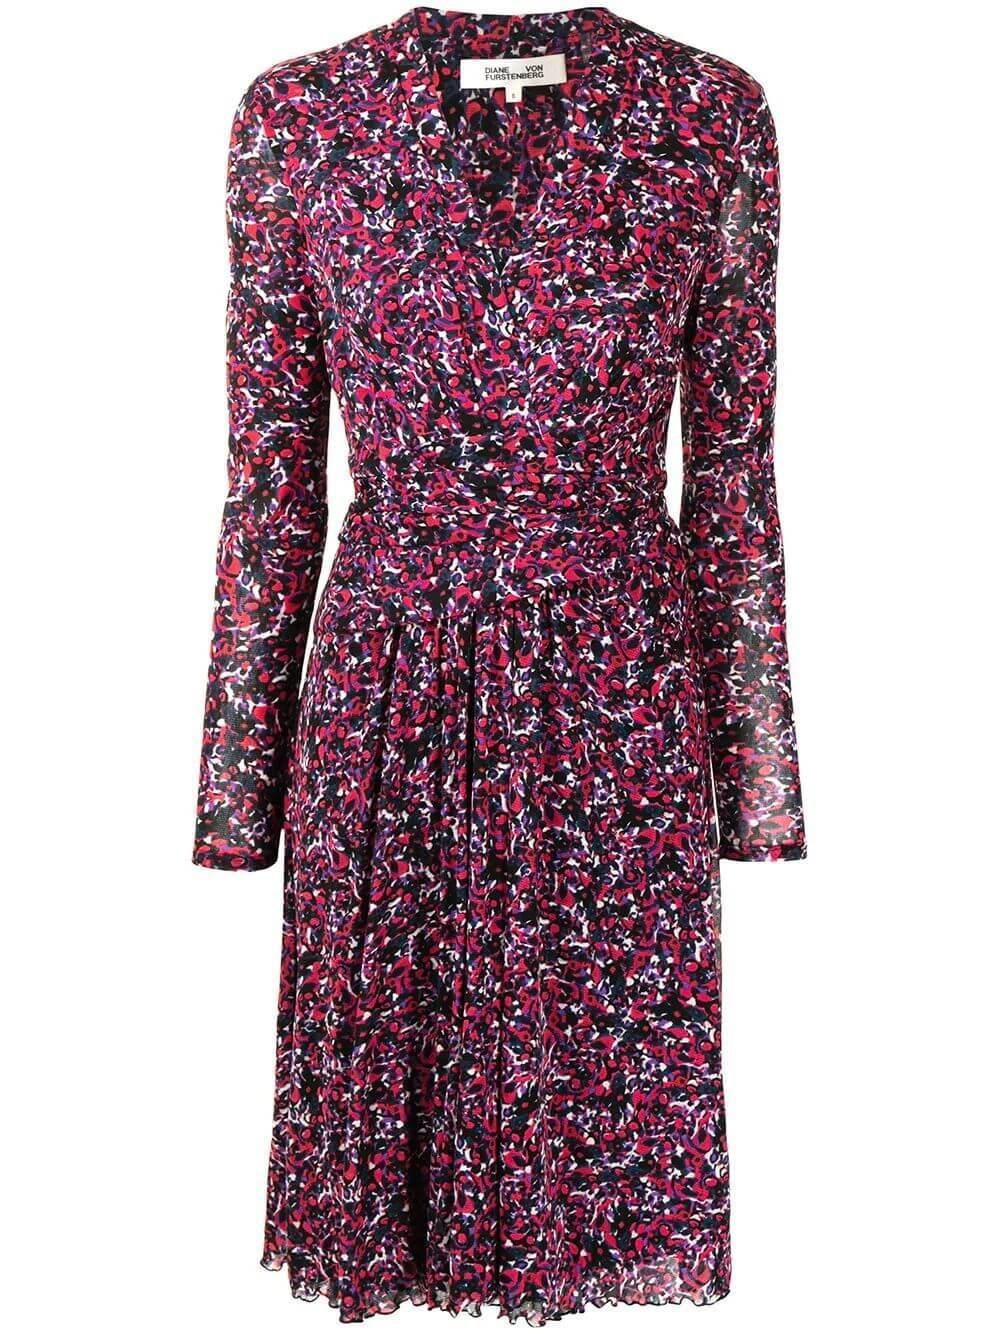 Brenda Dress Item # DW4O035